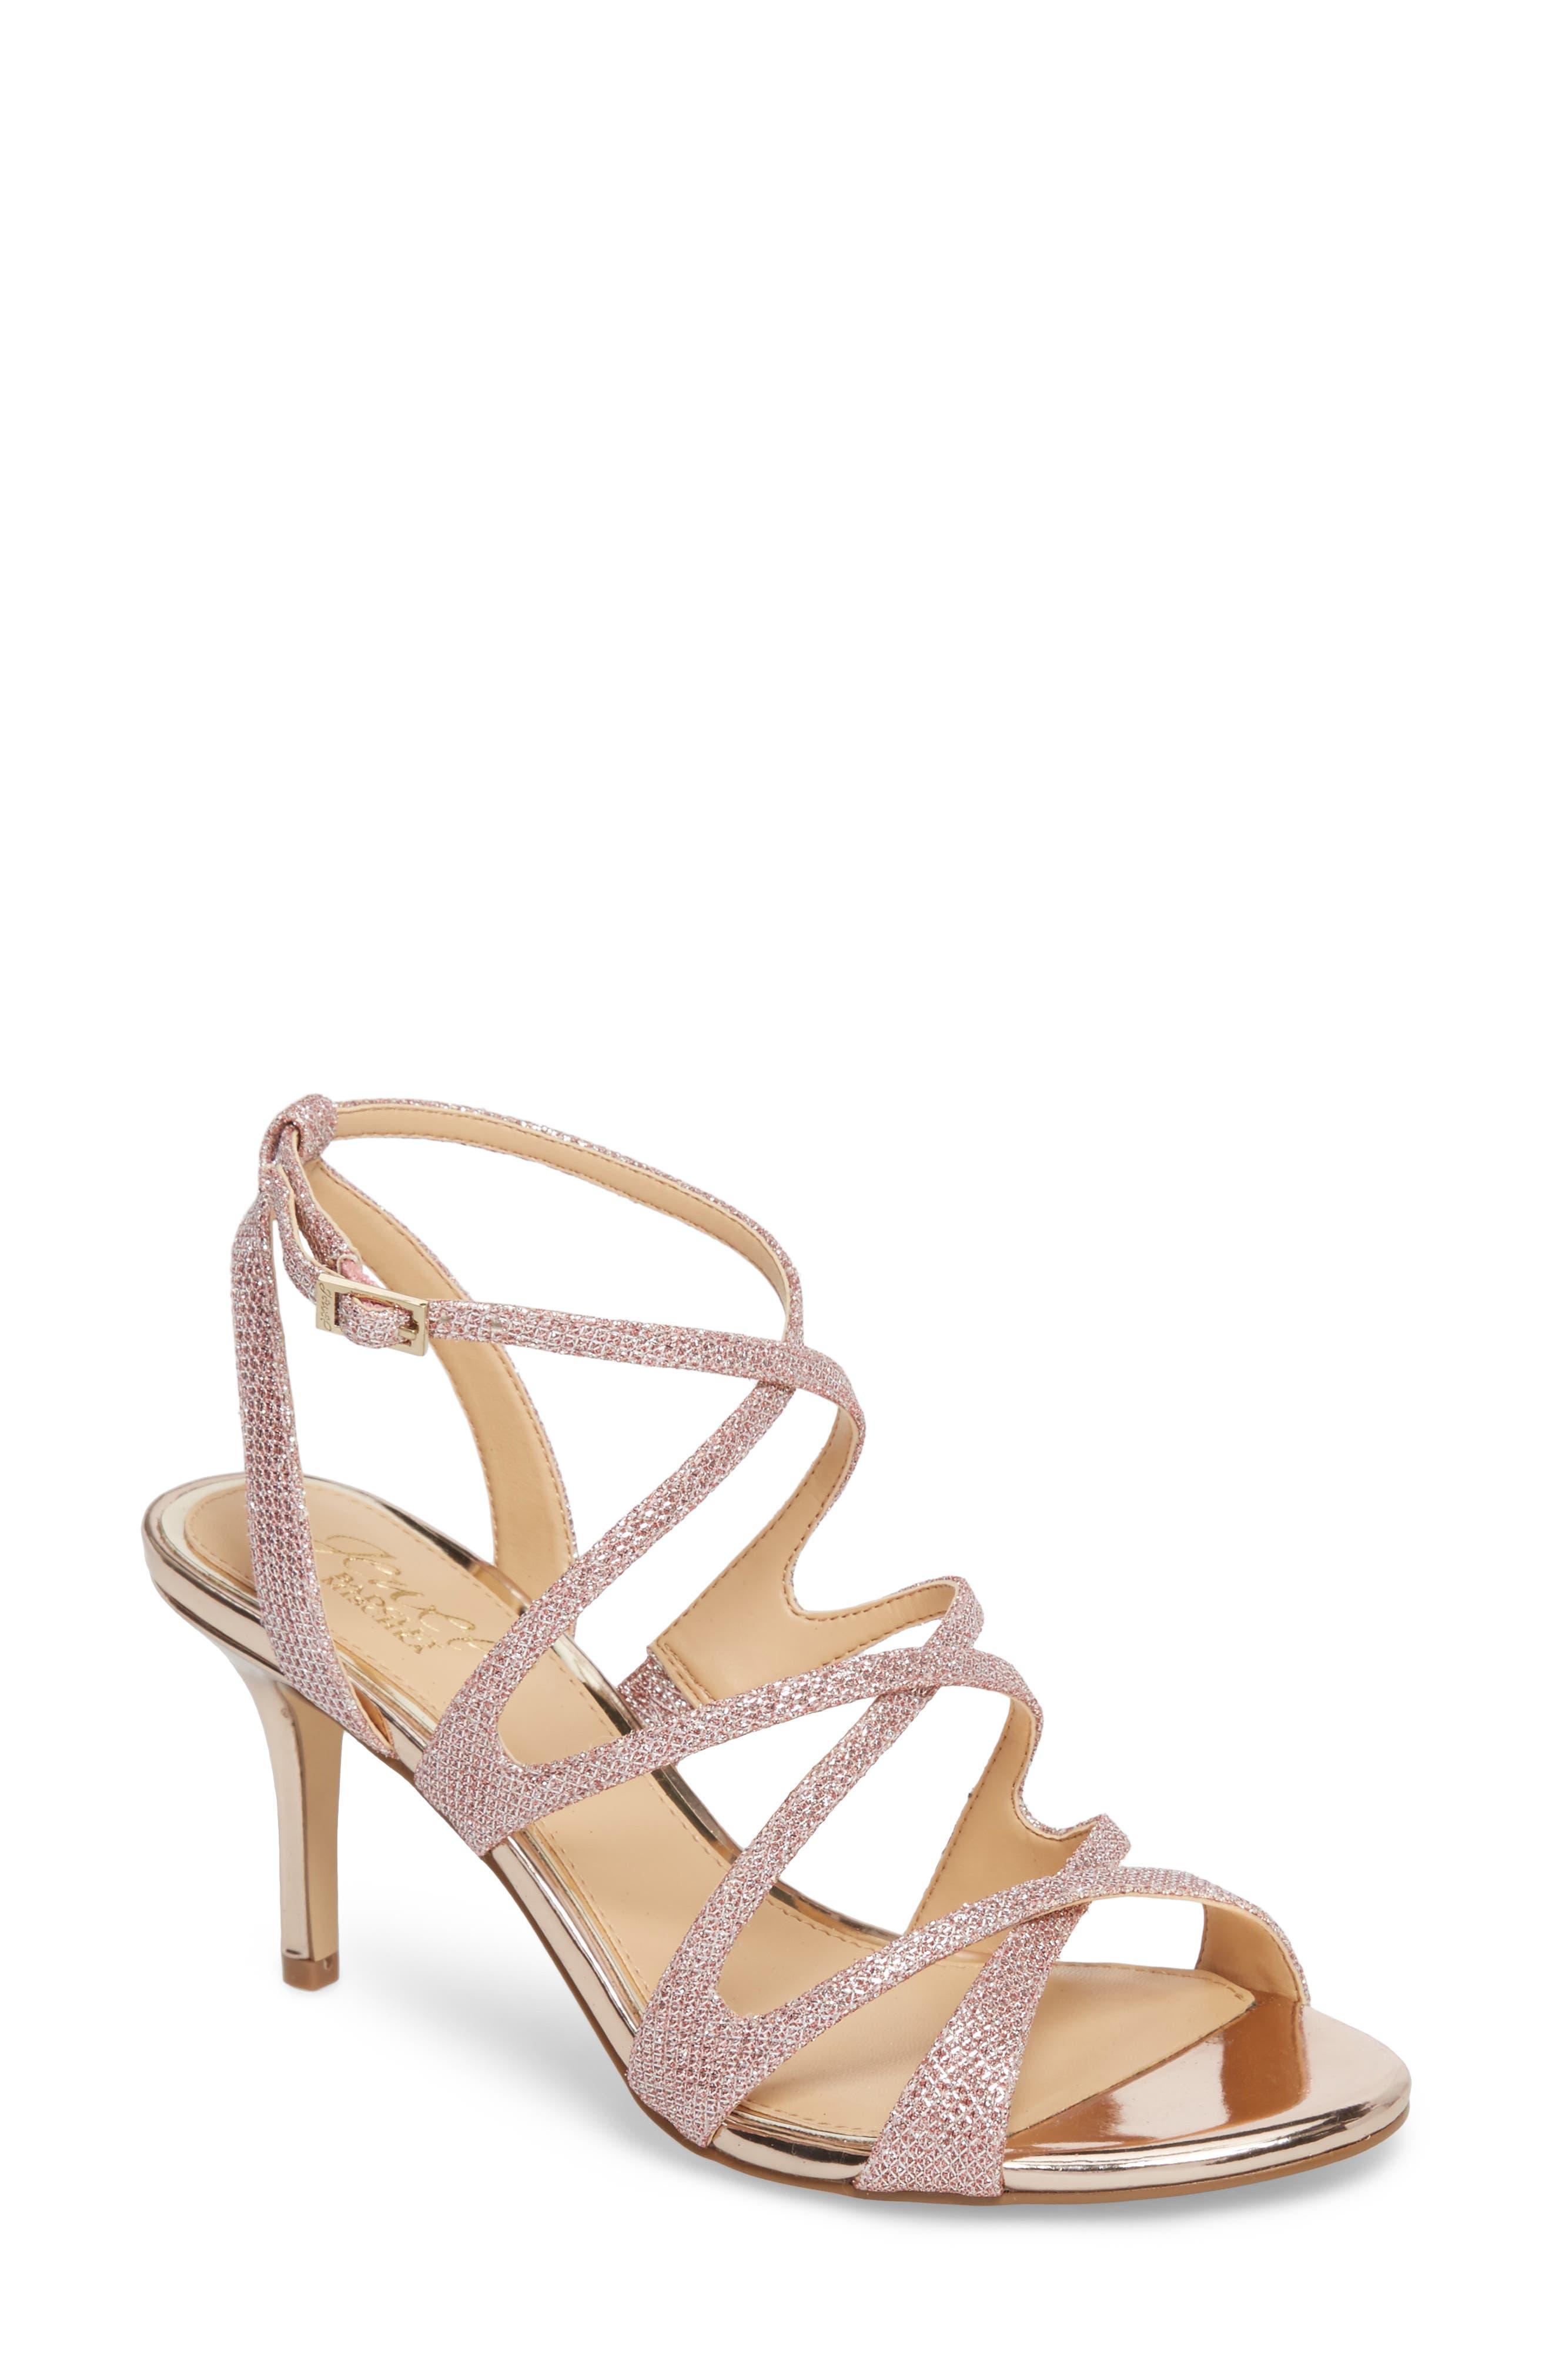 Tasha Glitter Sandal,                             Main thumbnail 1, color,                             Rose Gold Glitter